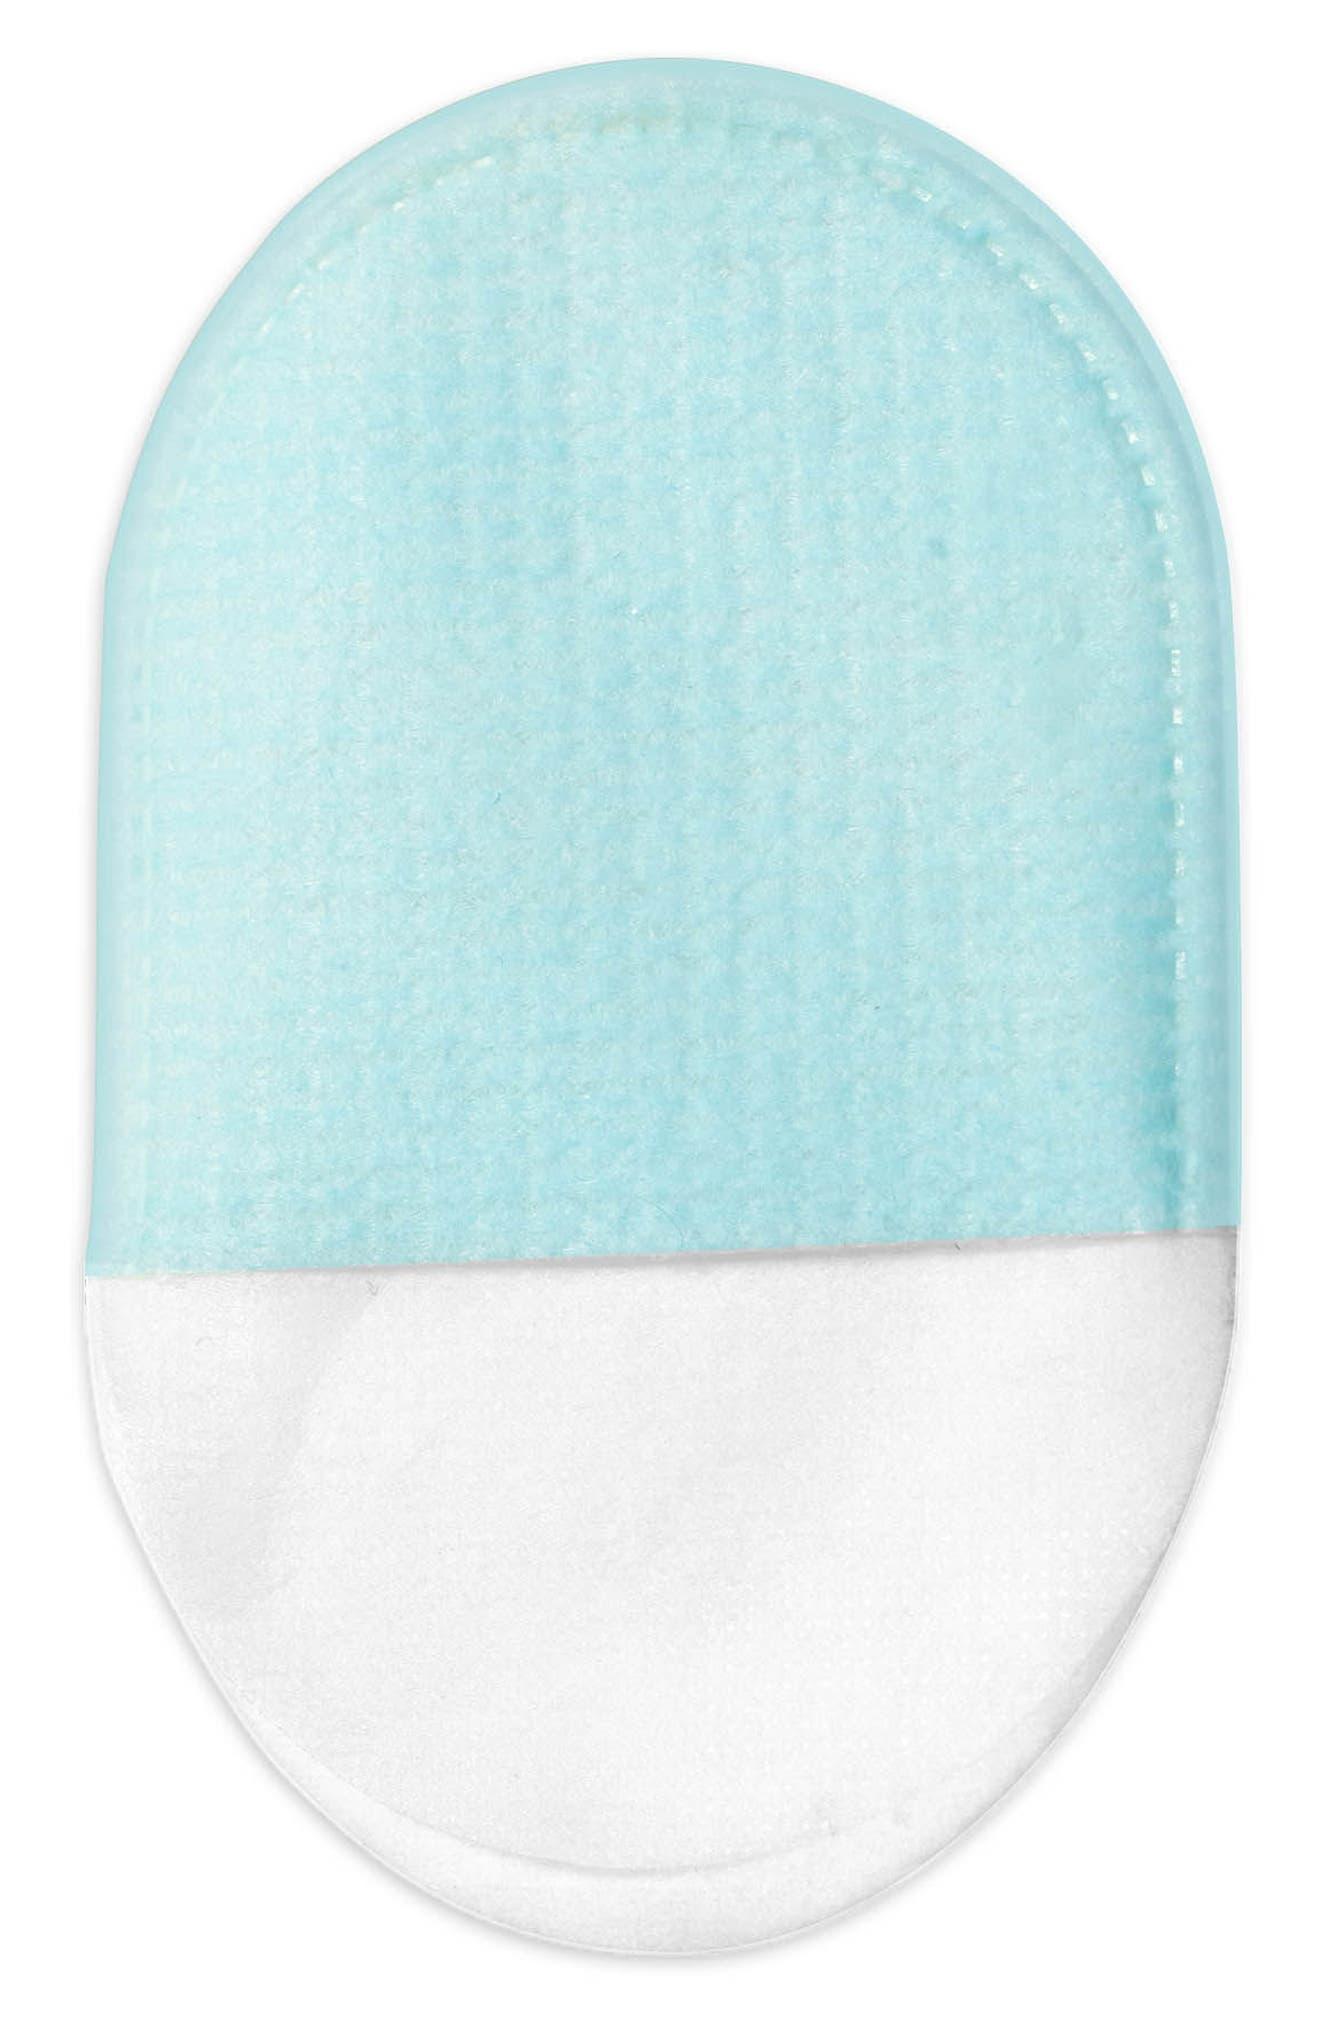 TULA PROBIOTIC SKINCARE, Dual Phase Skin Reviving Treatment Pads, Alternate thumbnail 3, color, NO COLOR